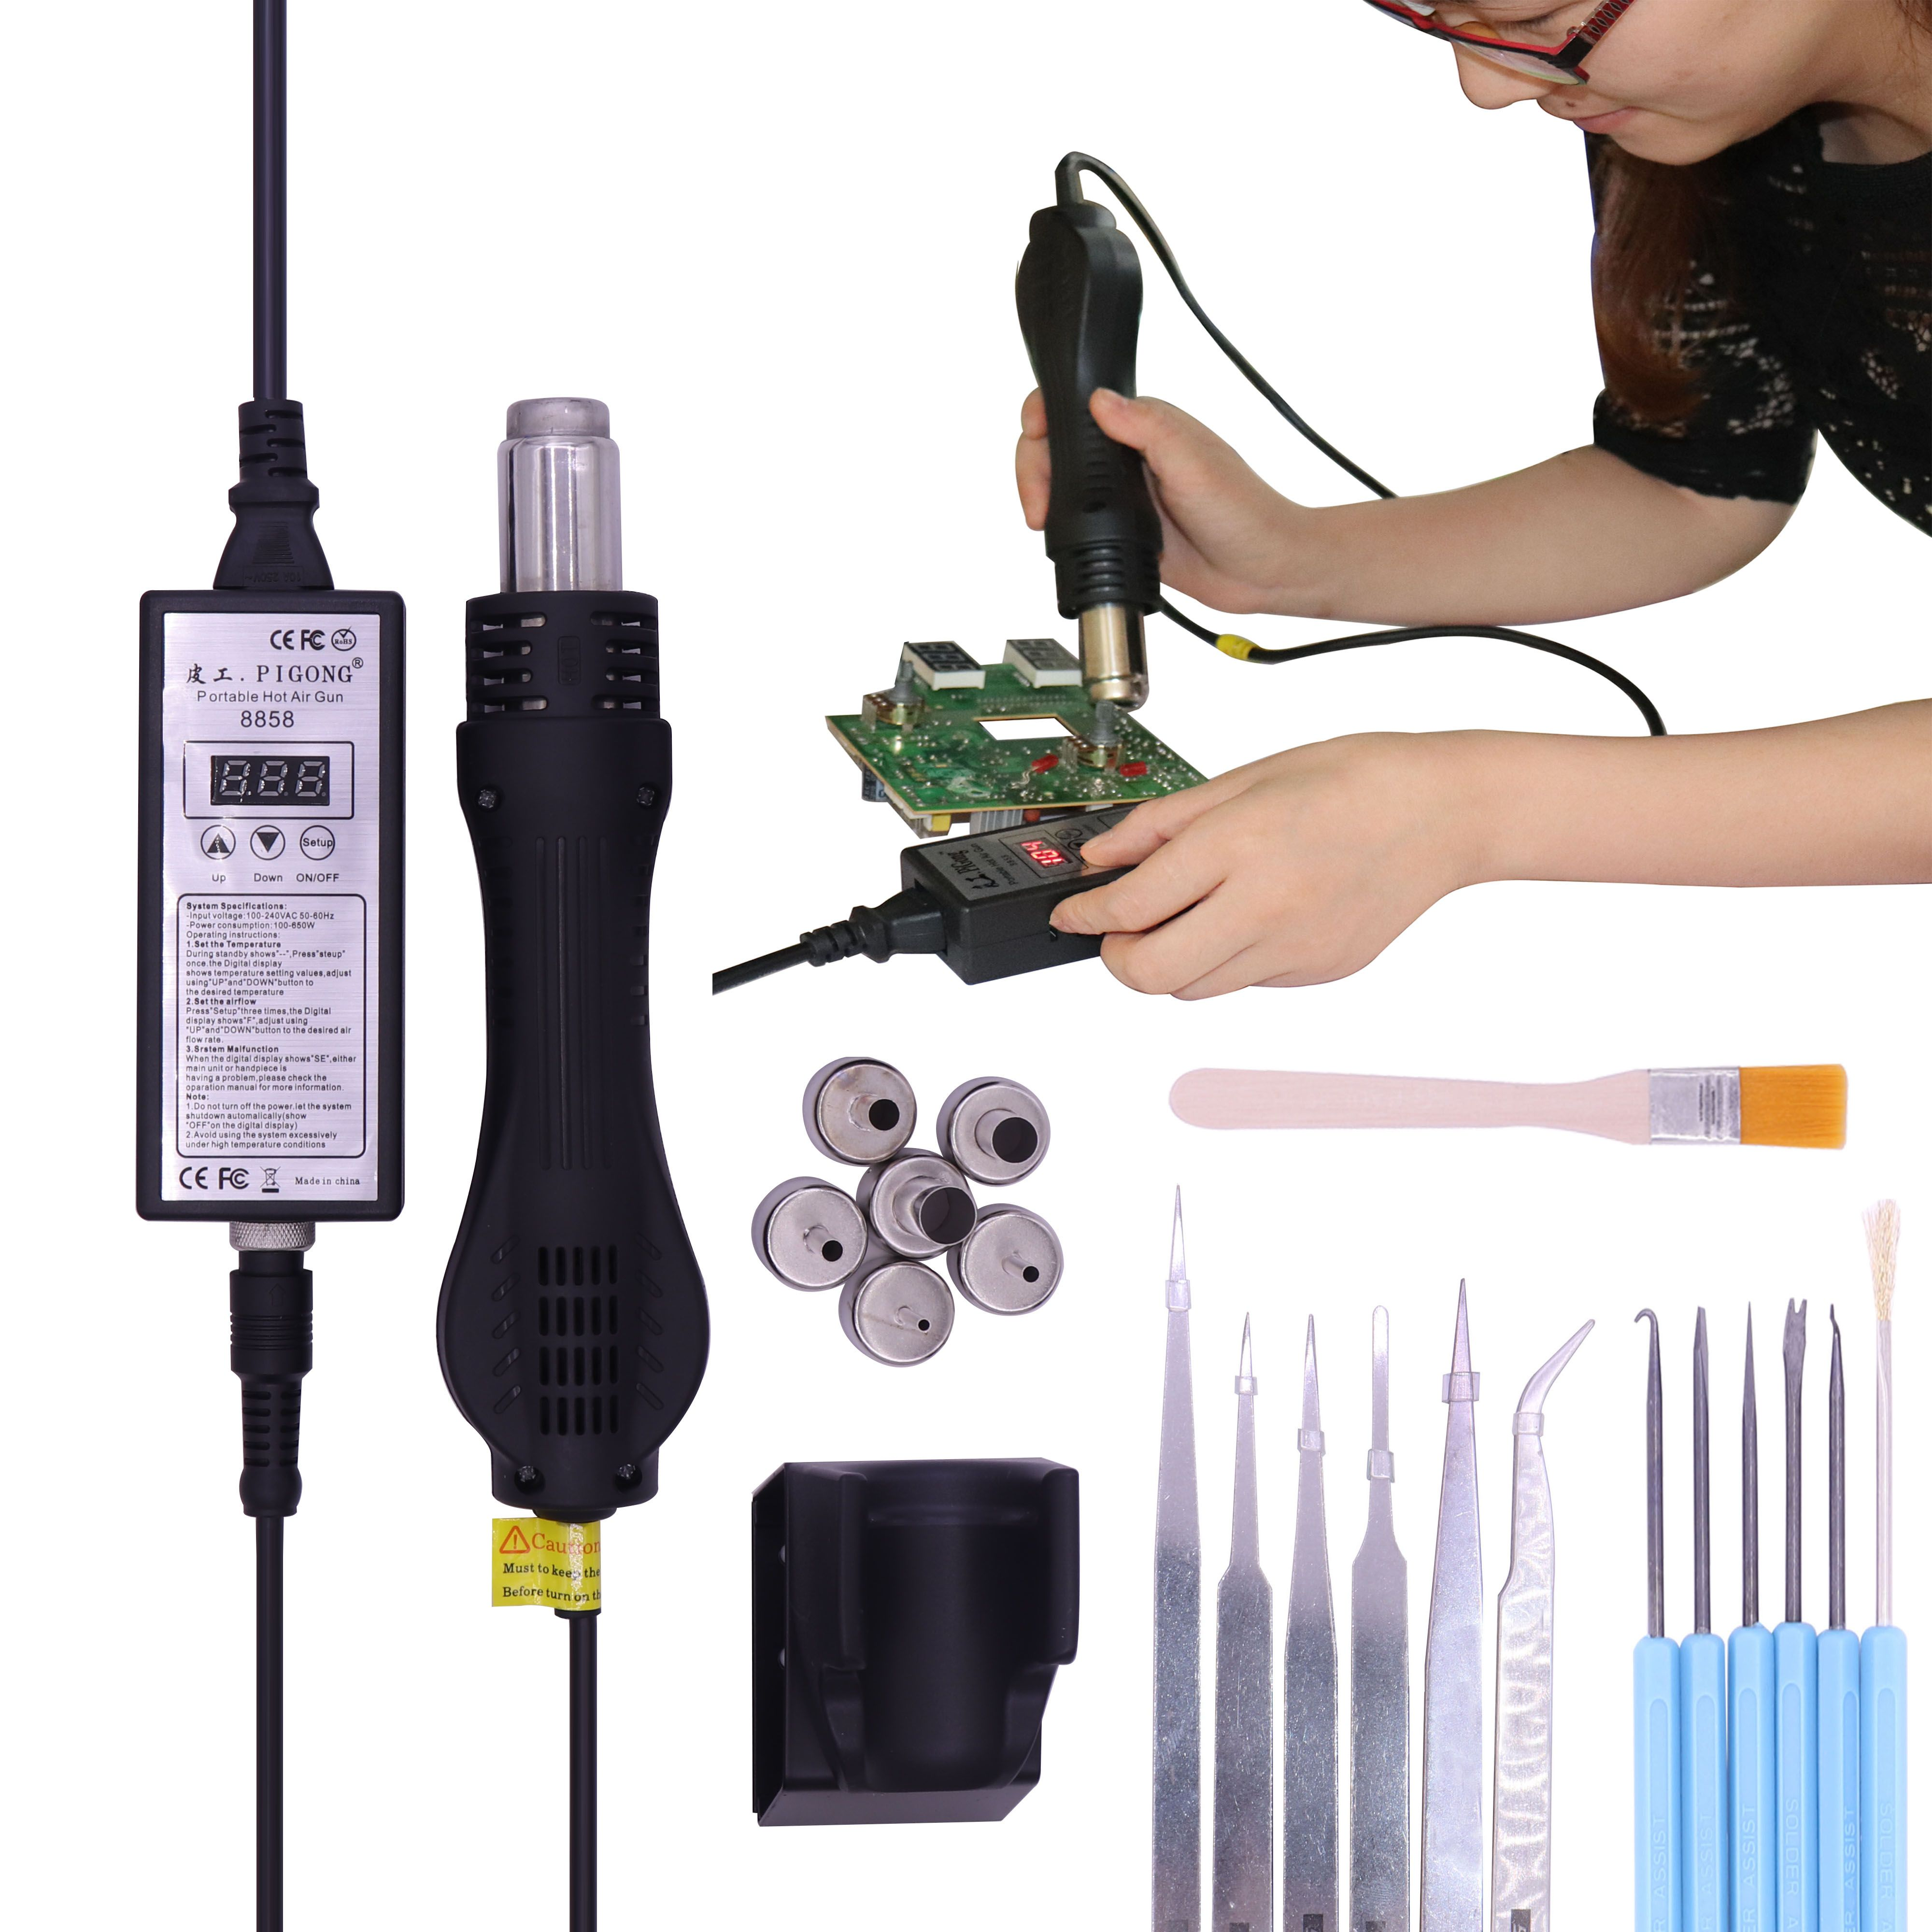 High quality 220V Portable BGA Rework soldering station Hot Air Blower Heat Gun 8858 Better Hand-held hot air gun 6pcs nozzle